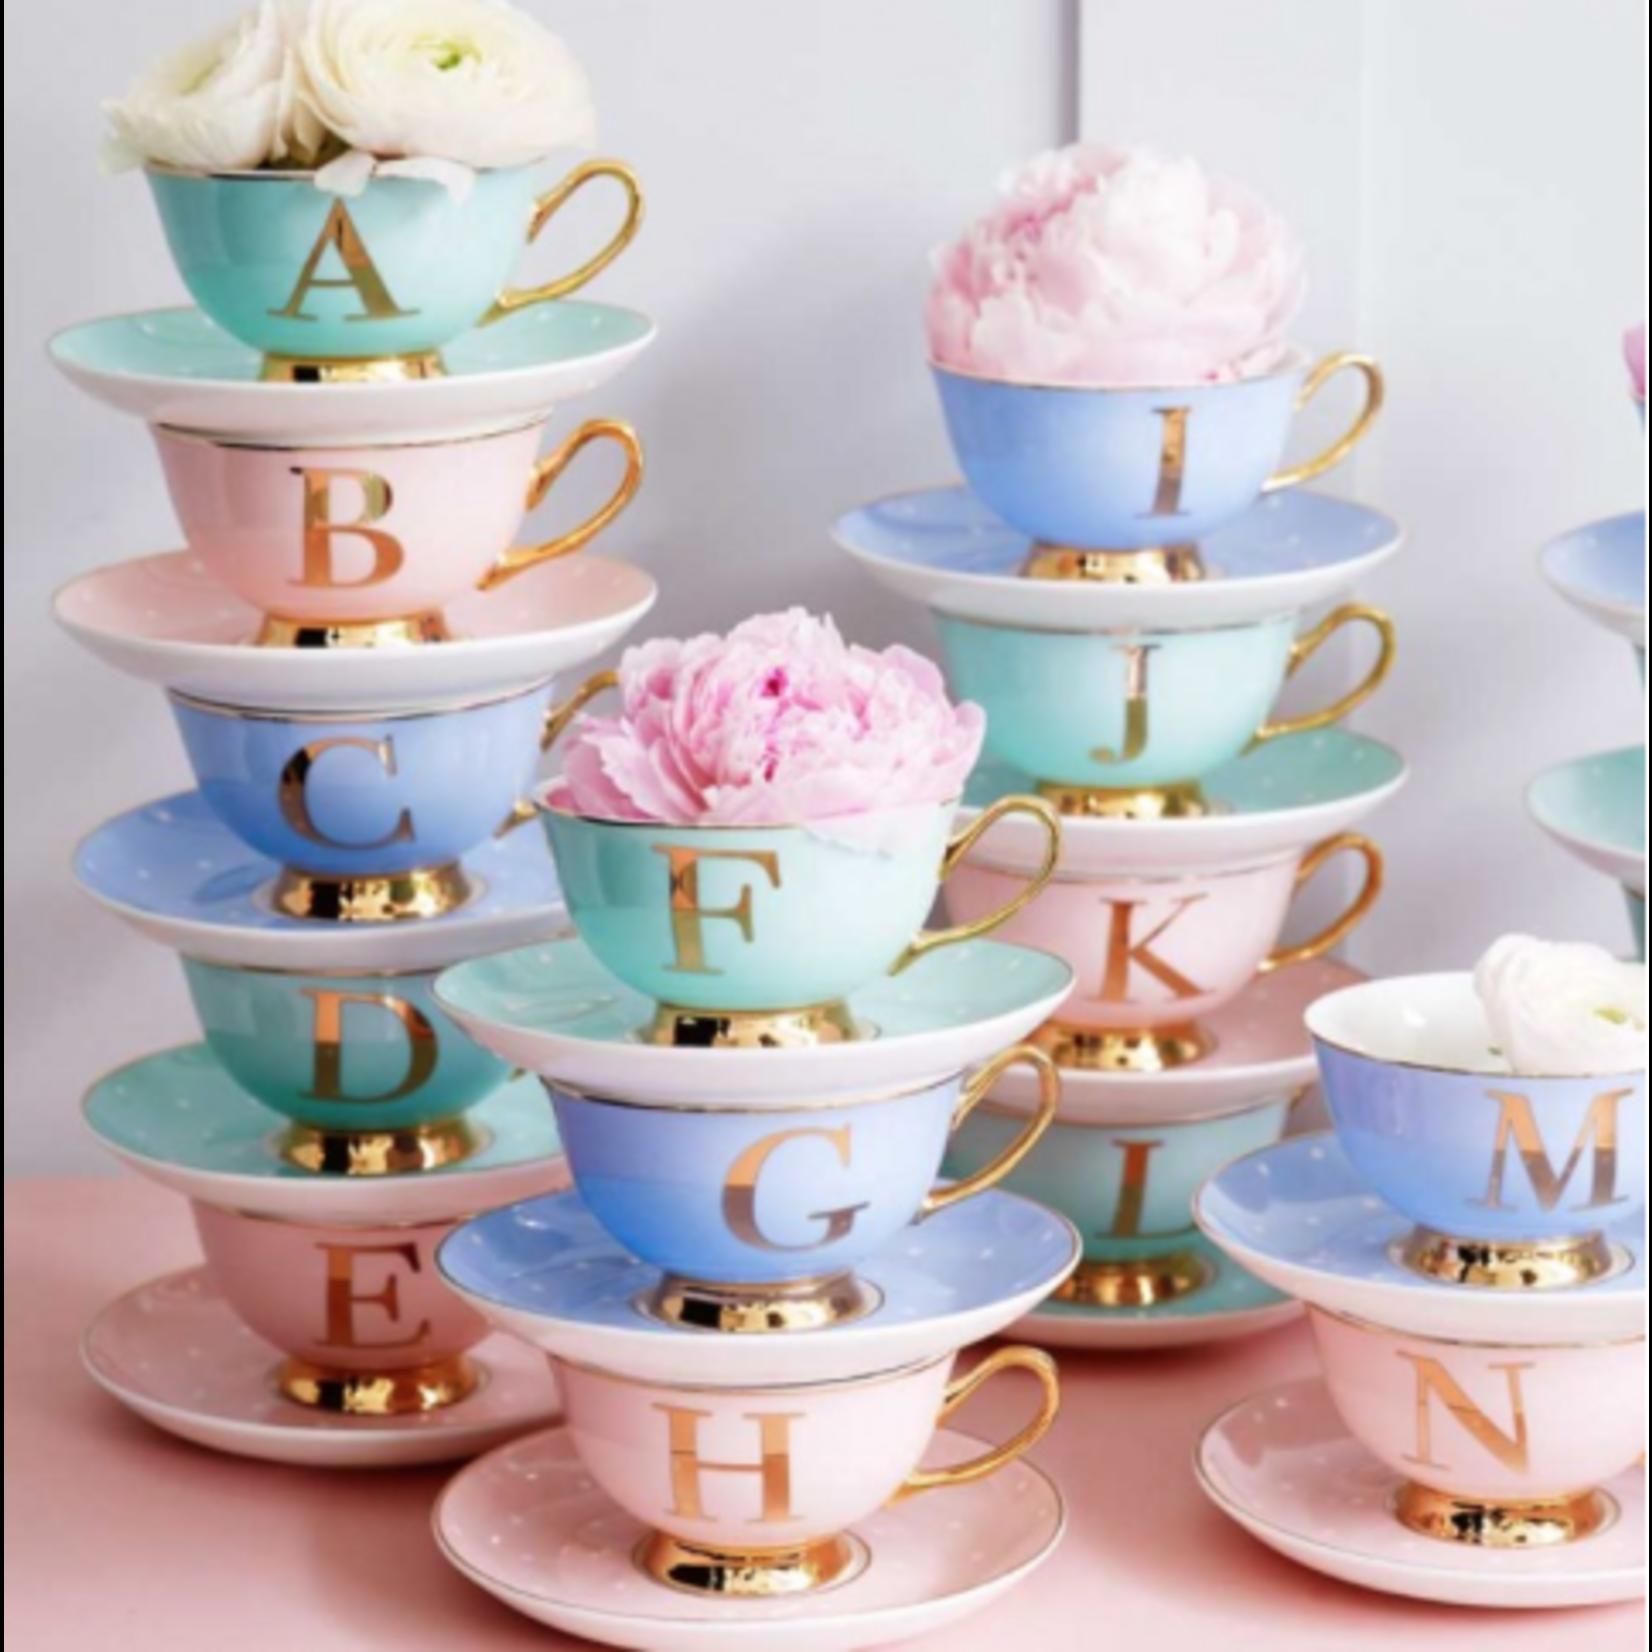 BoDuck Alphabet Spotty Teacup and Saucer Letter V Gold/Mint